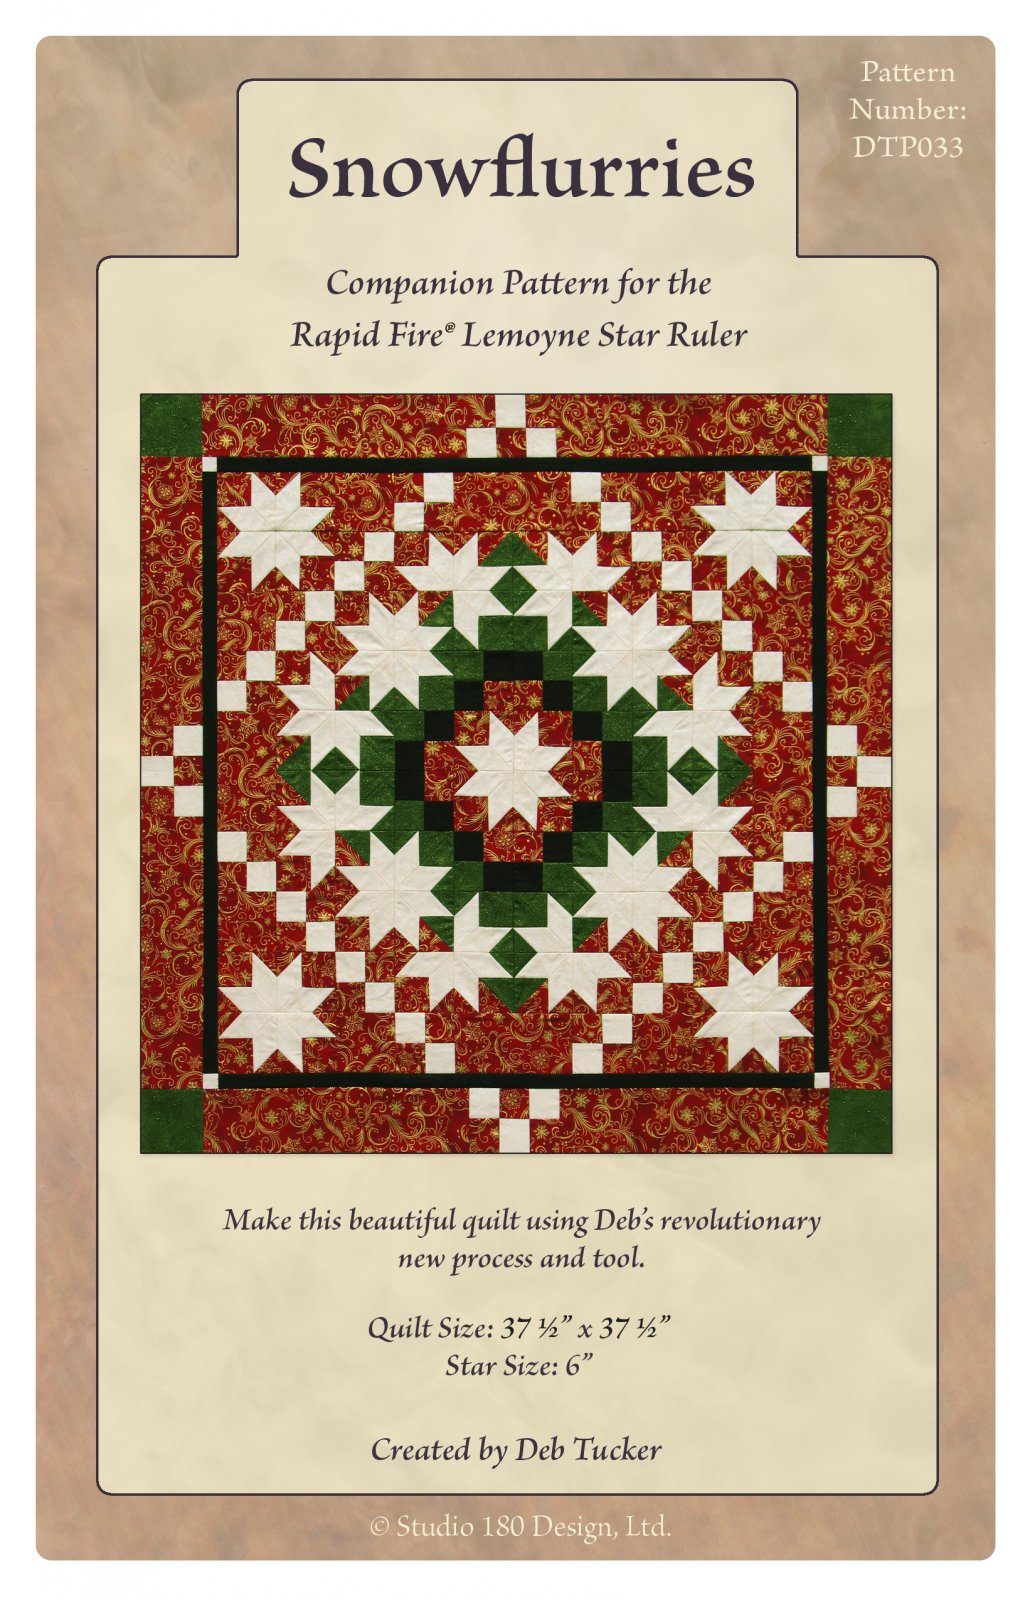 Snowflurries Quilt Pattern - Studio 180 Design- Deb Tucker